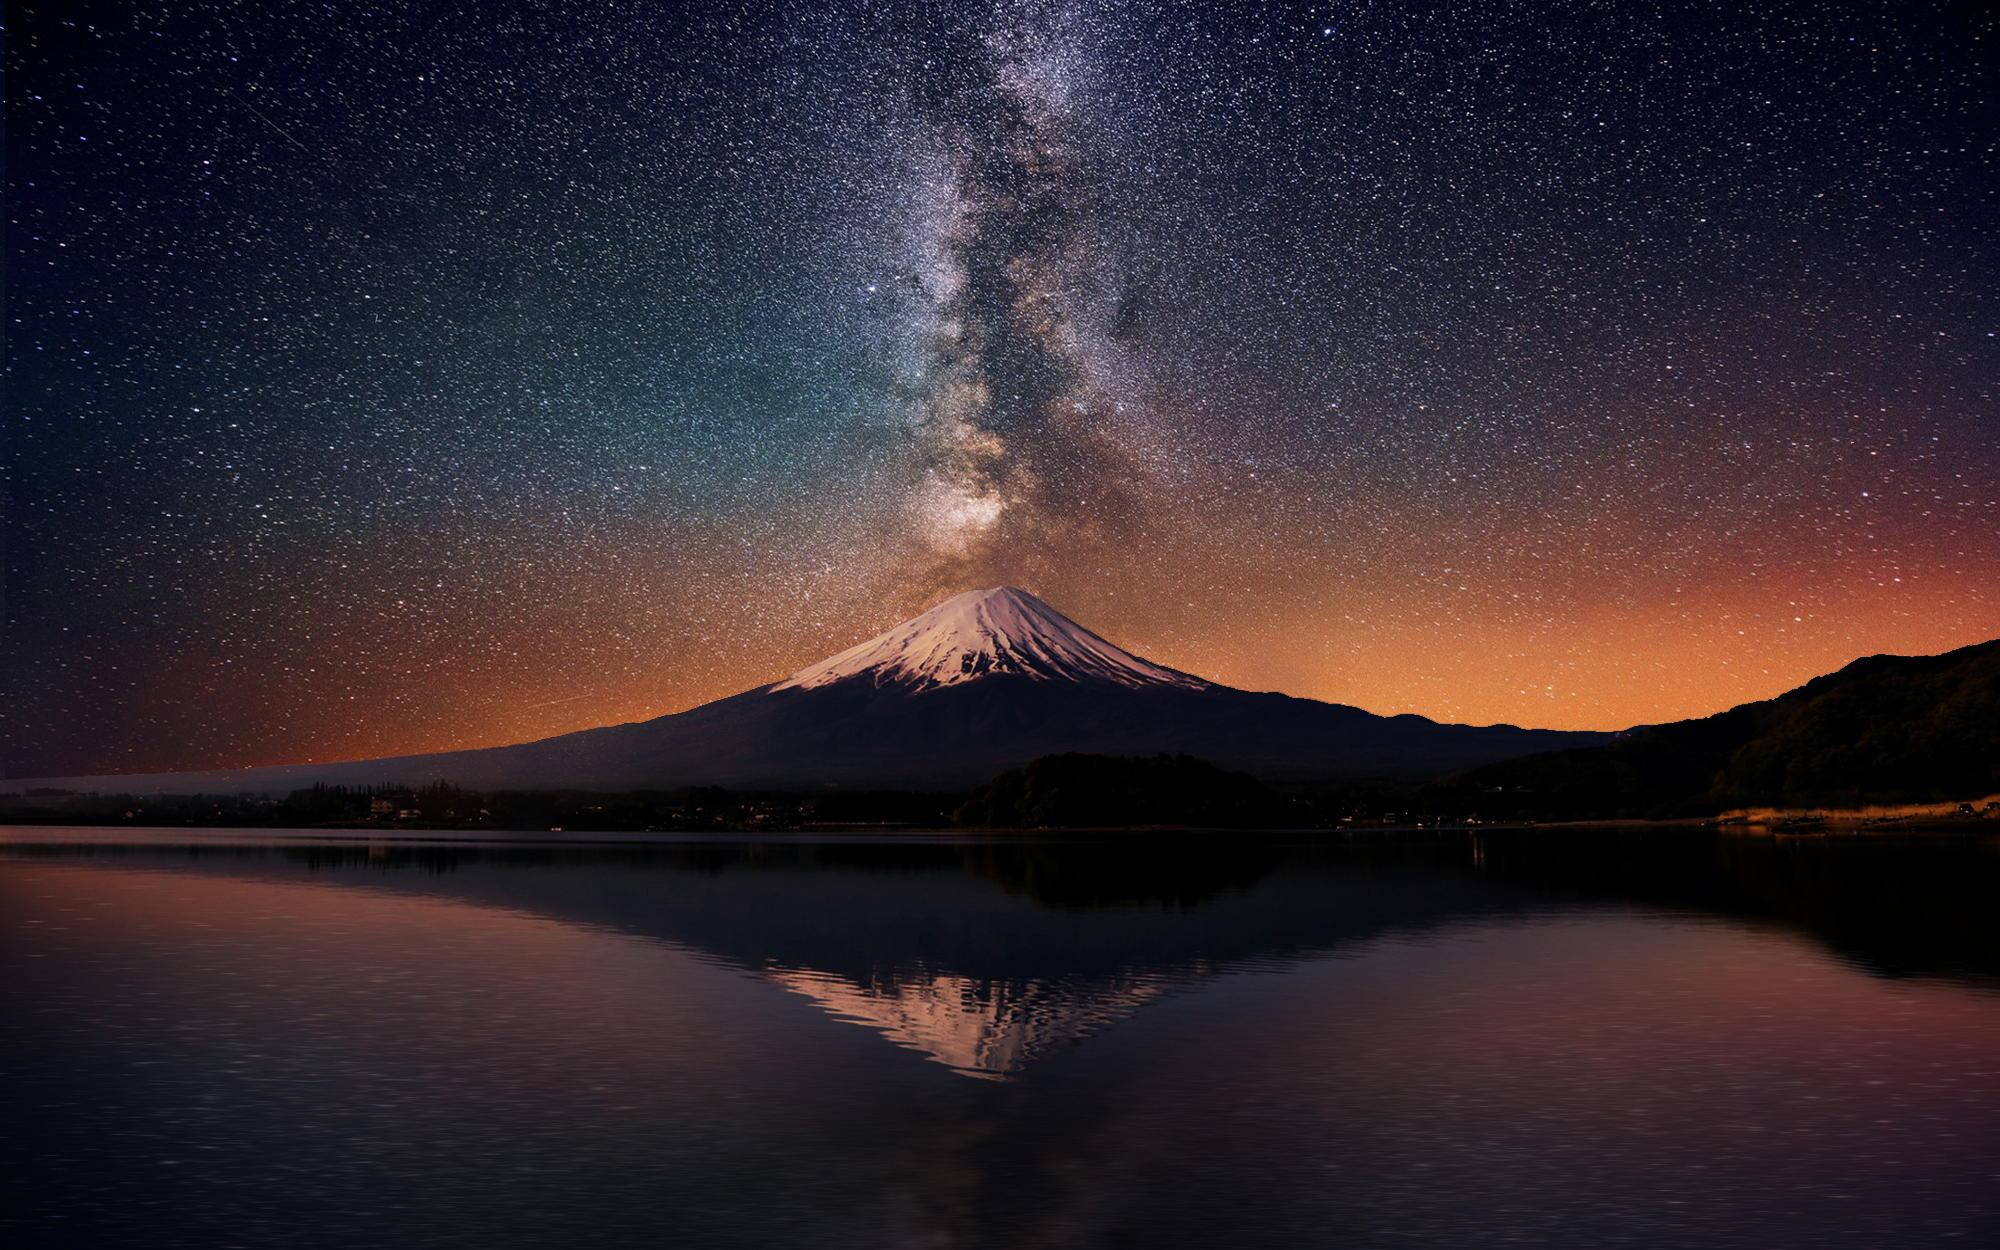 Fall Mountains Iphone Wallpaper Download Free Milky Way Galaxy Backgrounds Pixelstalk Net